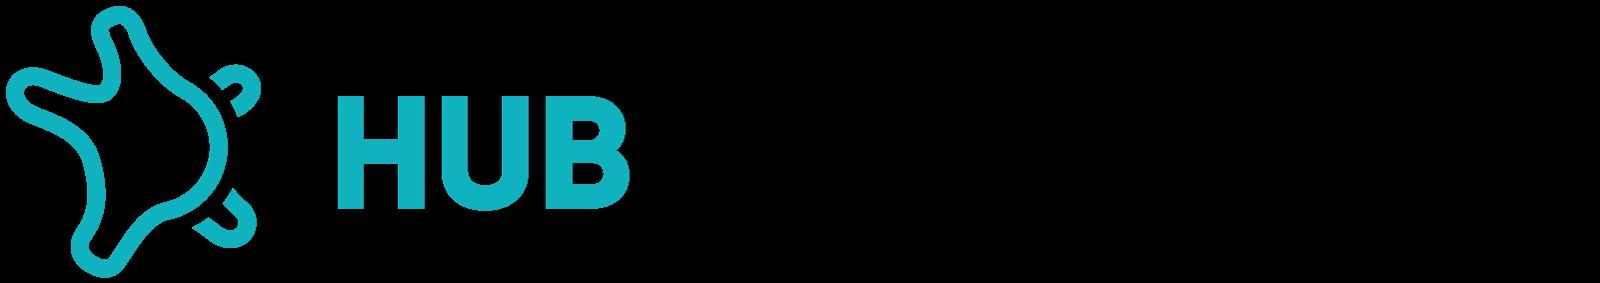 logo-hub-organoids-color